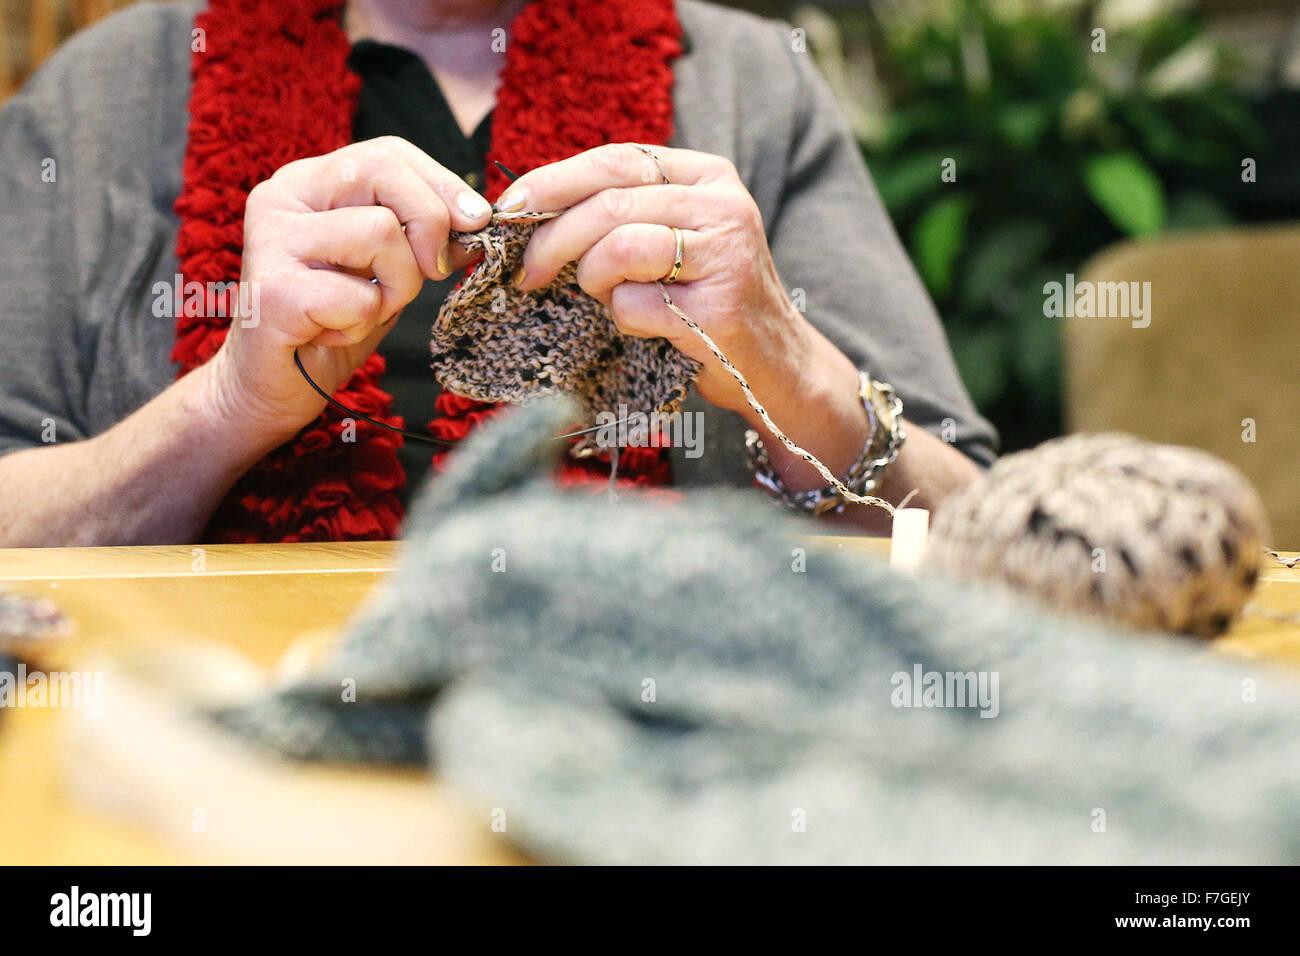 Napa, CA, USA. 28th Nov, 2015. Susan Blake knits in the club house at The Reserve in Napa on Saturday. Blake, and - Stock Image